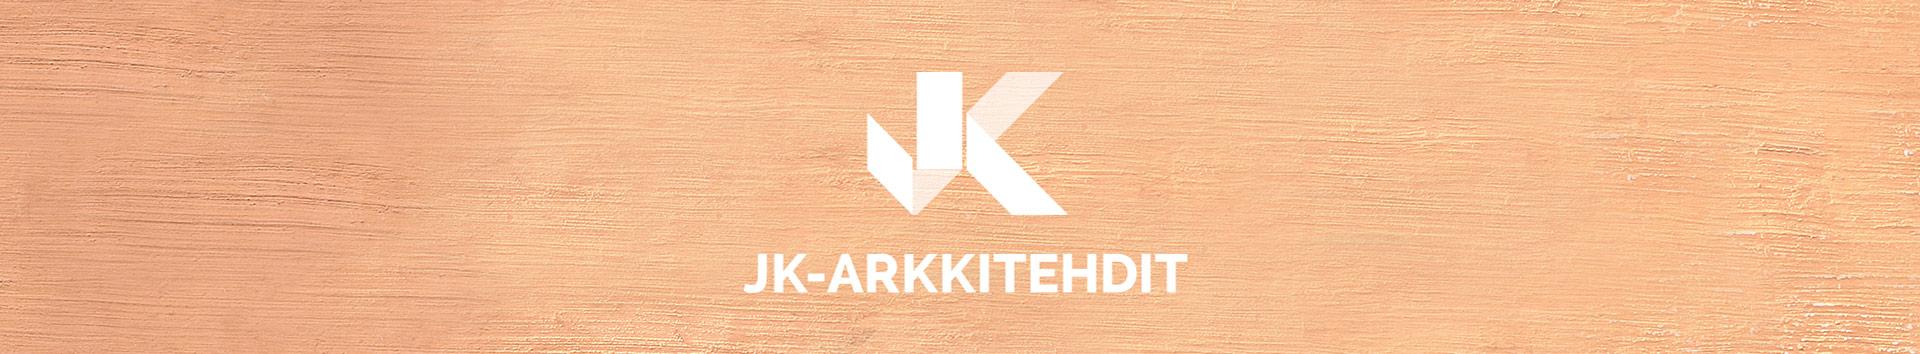 JK-arkkitehdit logo